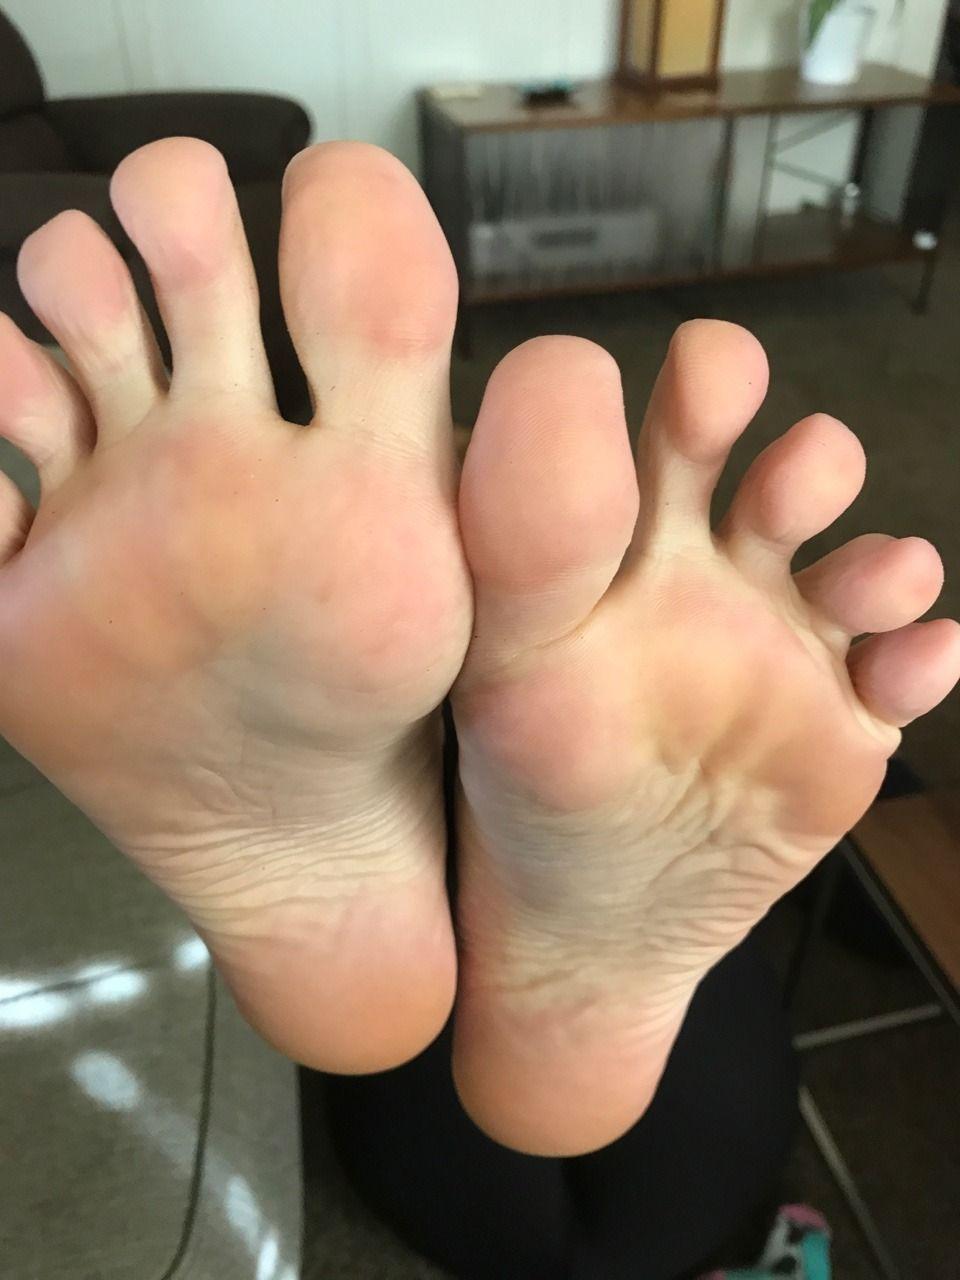 candid street feet  9c17643fa8